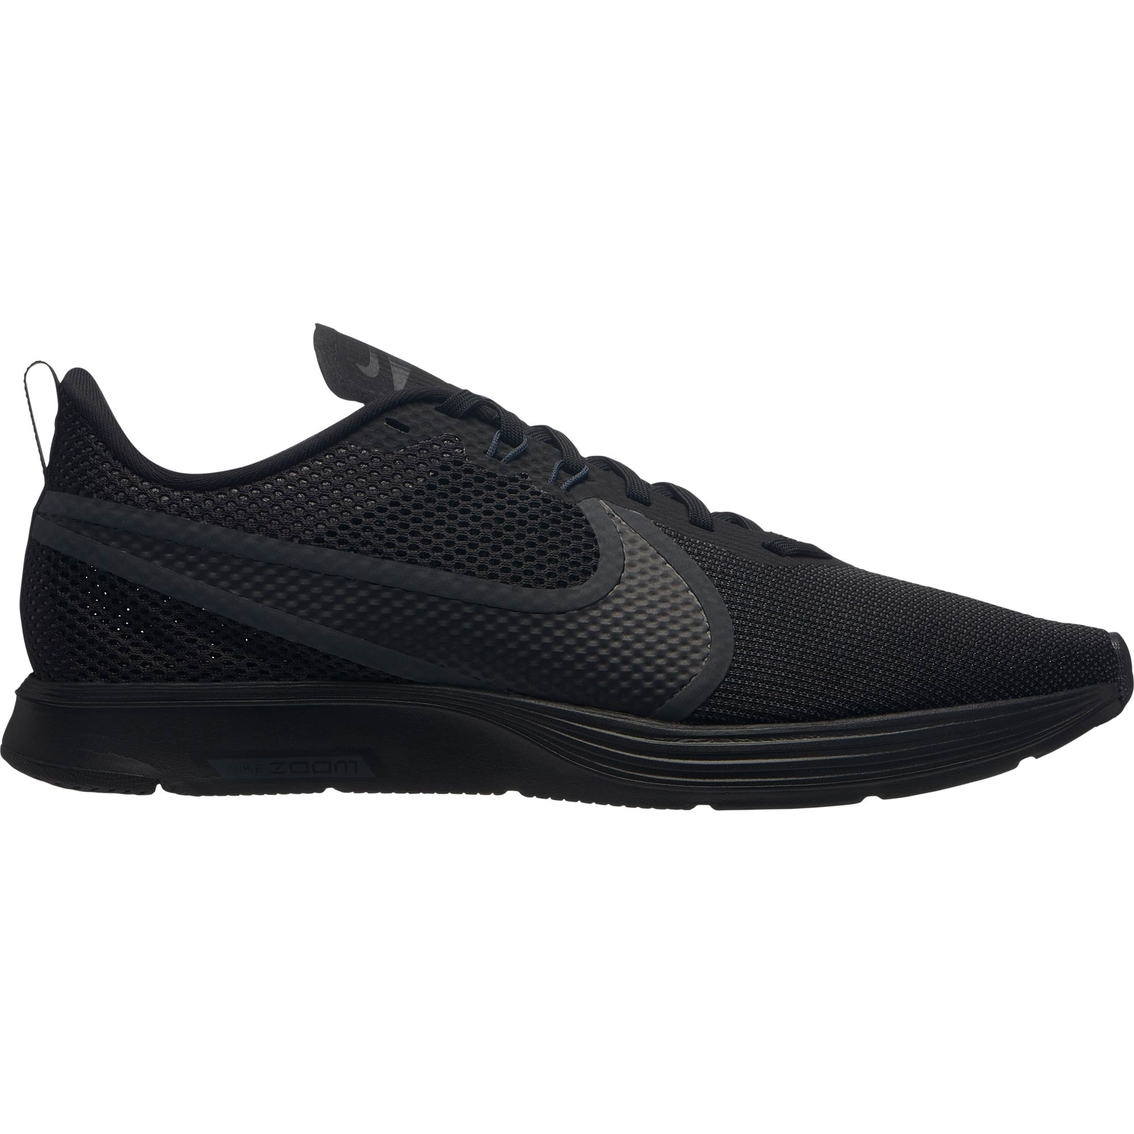 3b690a2d79f54b Nike Zoom Strike 2 Running Shoes